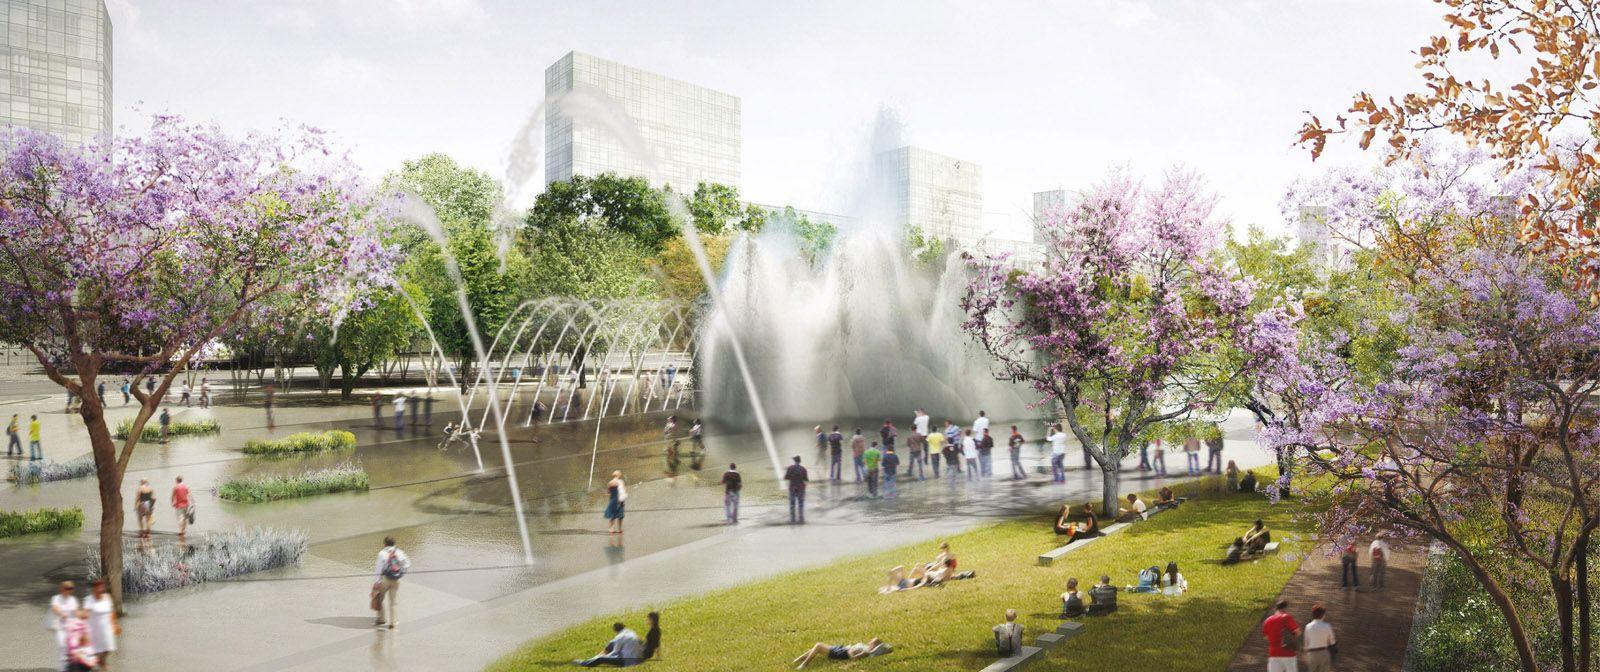 Water Fountain In Rendering Google Search Urban Landscape Public Architecture Linear Park